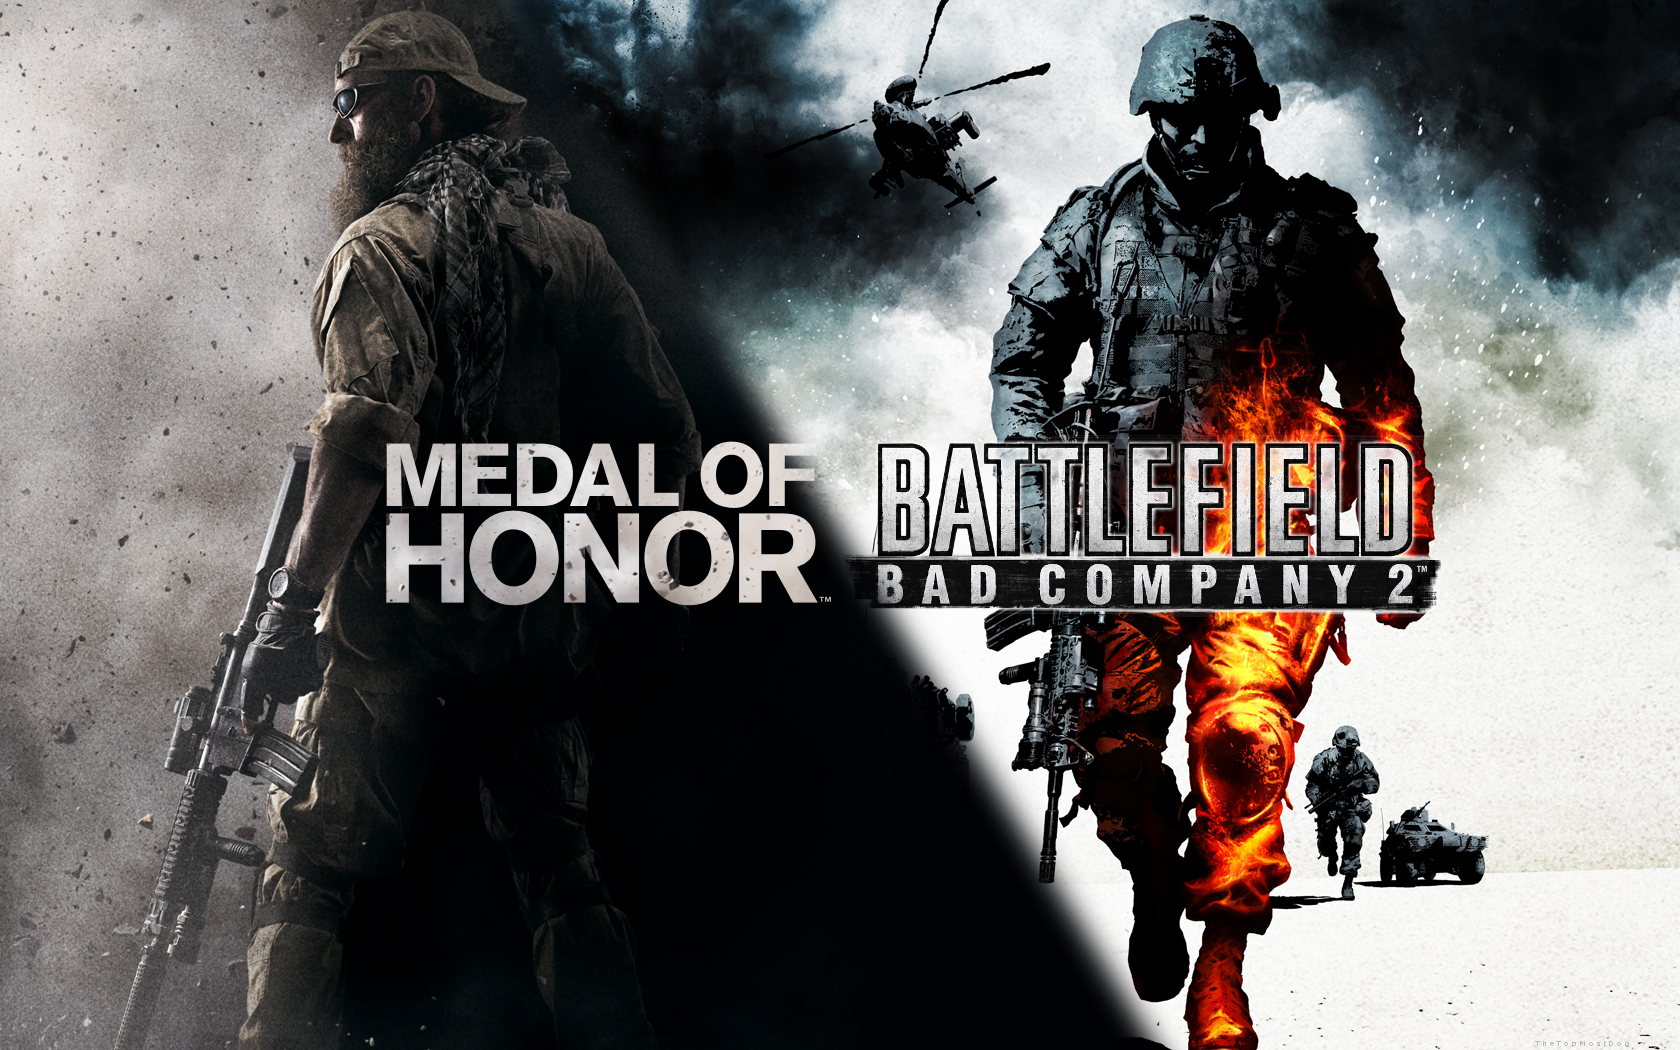 Battlefield 3 Bad Company 2 Vietnam Wallpapers   Taringa 1680x1050